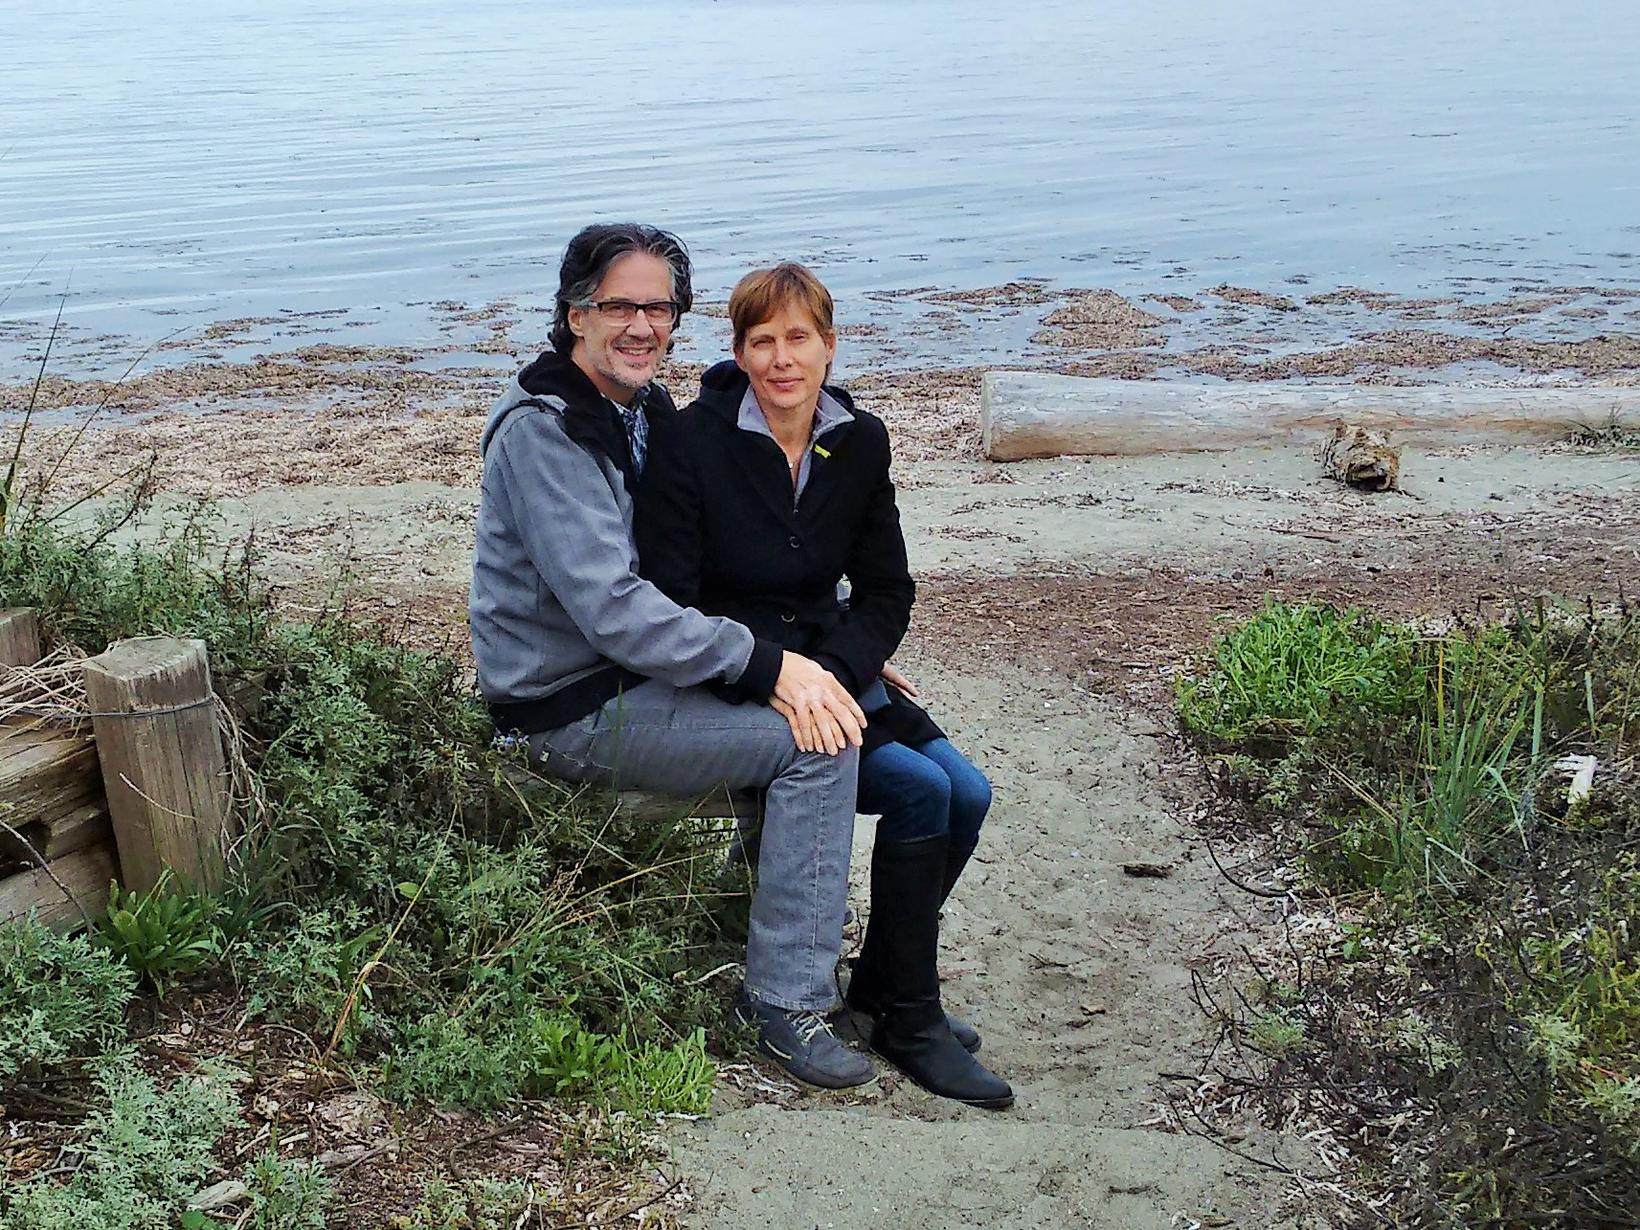 Elizabeth & Jason from Nanaimo, British Columbia, Canada